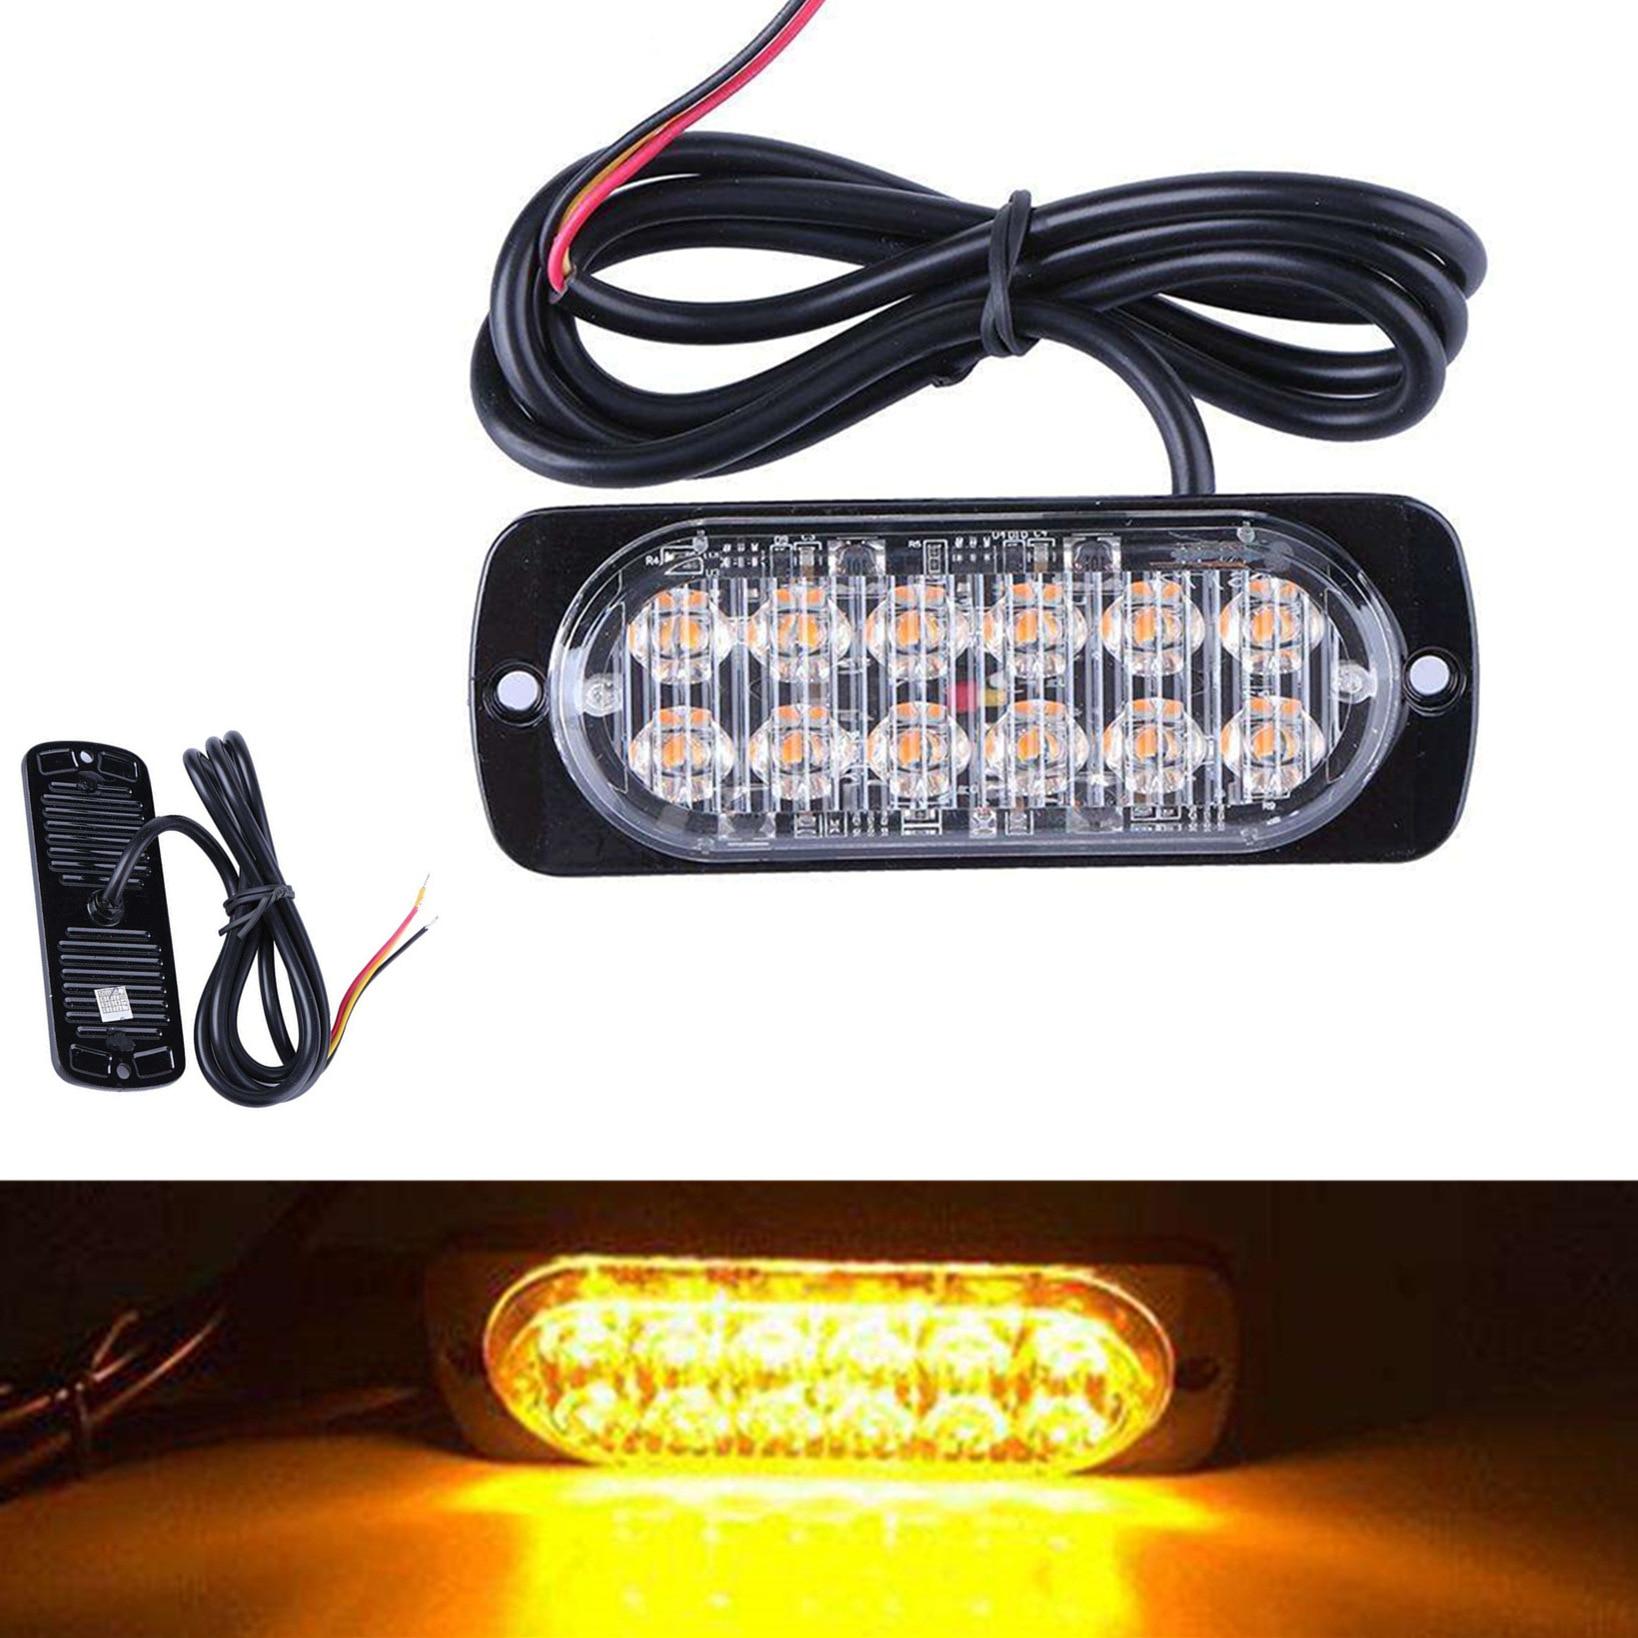 Car Body Warning Light 12 LED Ultrathin 36W 12-24V Truck Motorcycle Aluminum Case Traffic Safety Protect Side Edge Warning Light